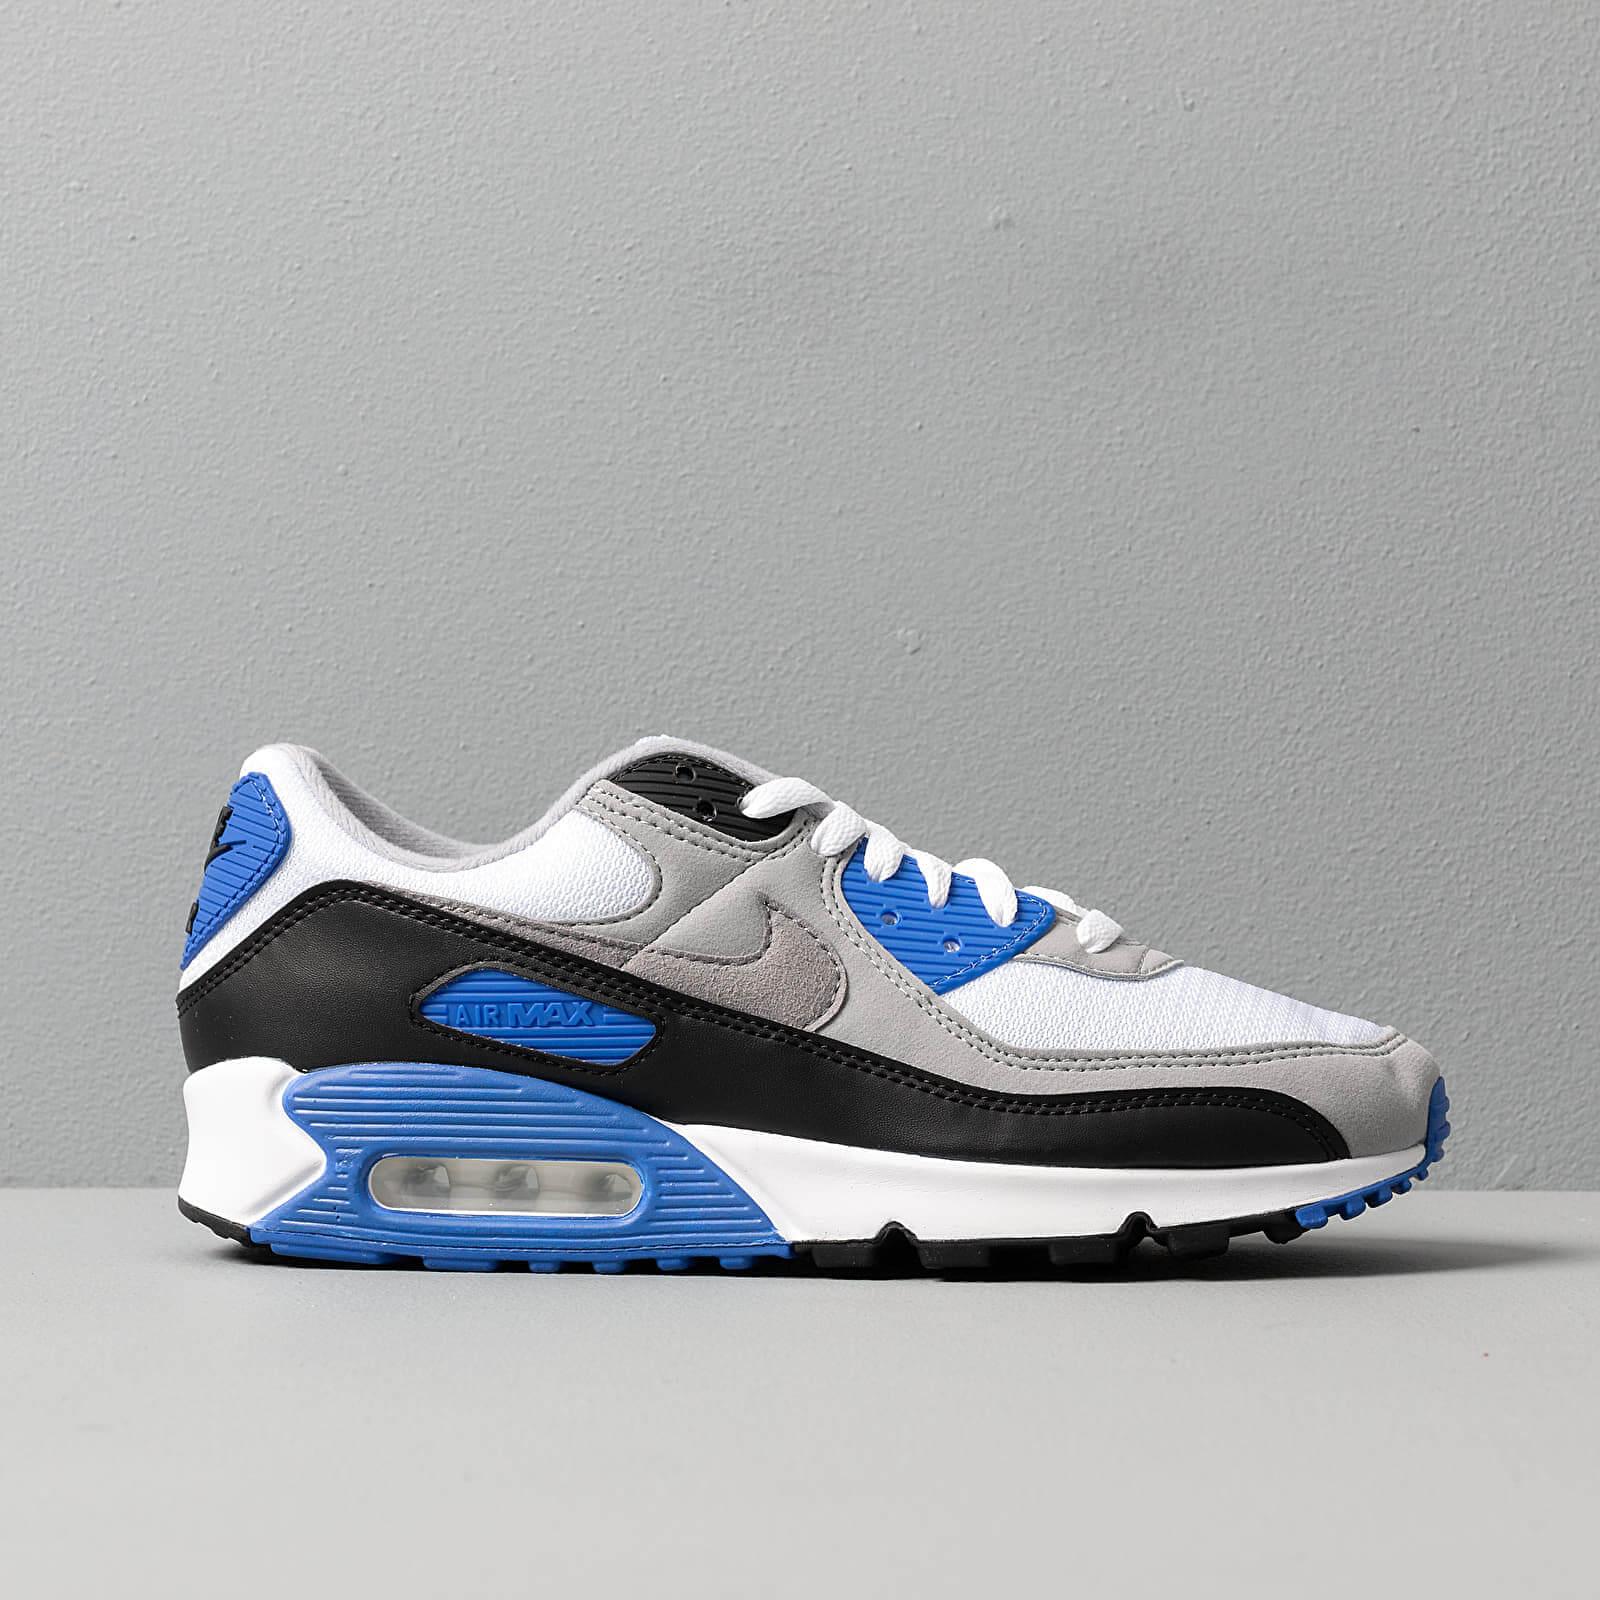 Nike Air MAx 90, foto Footshop